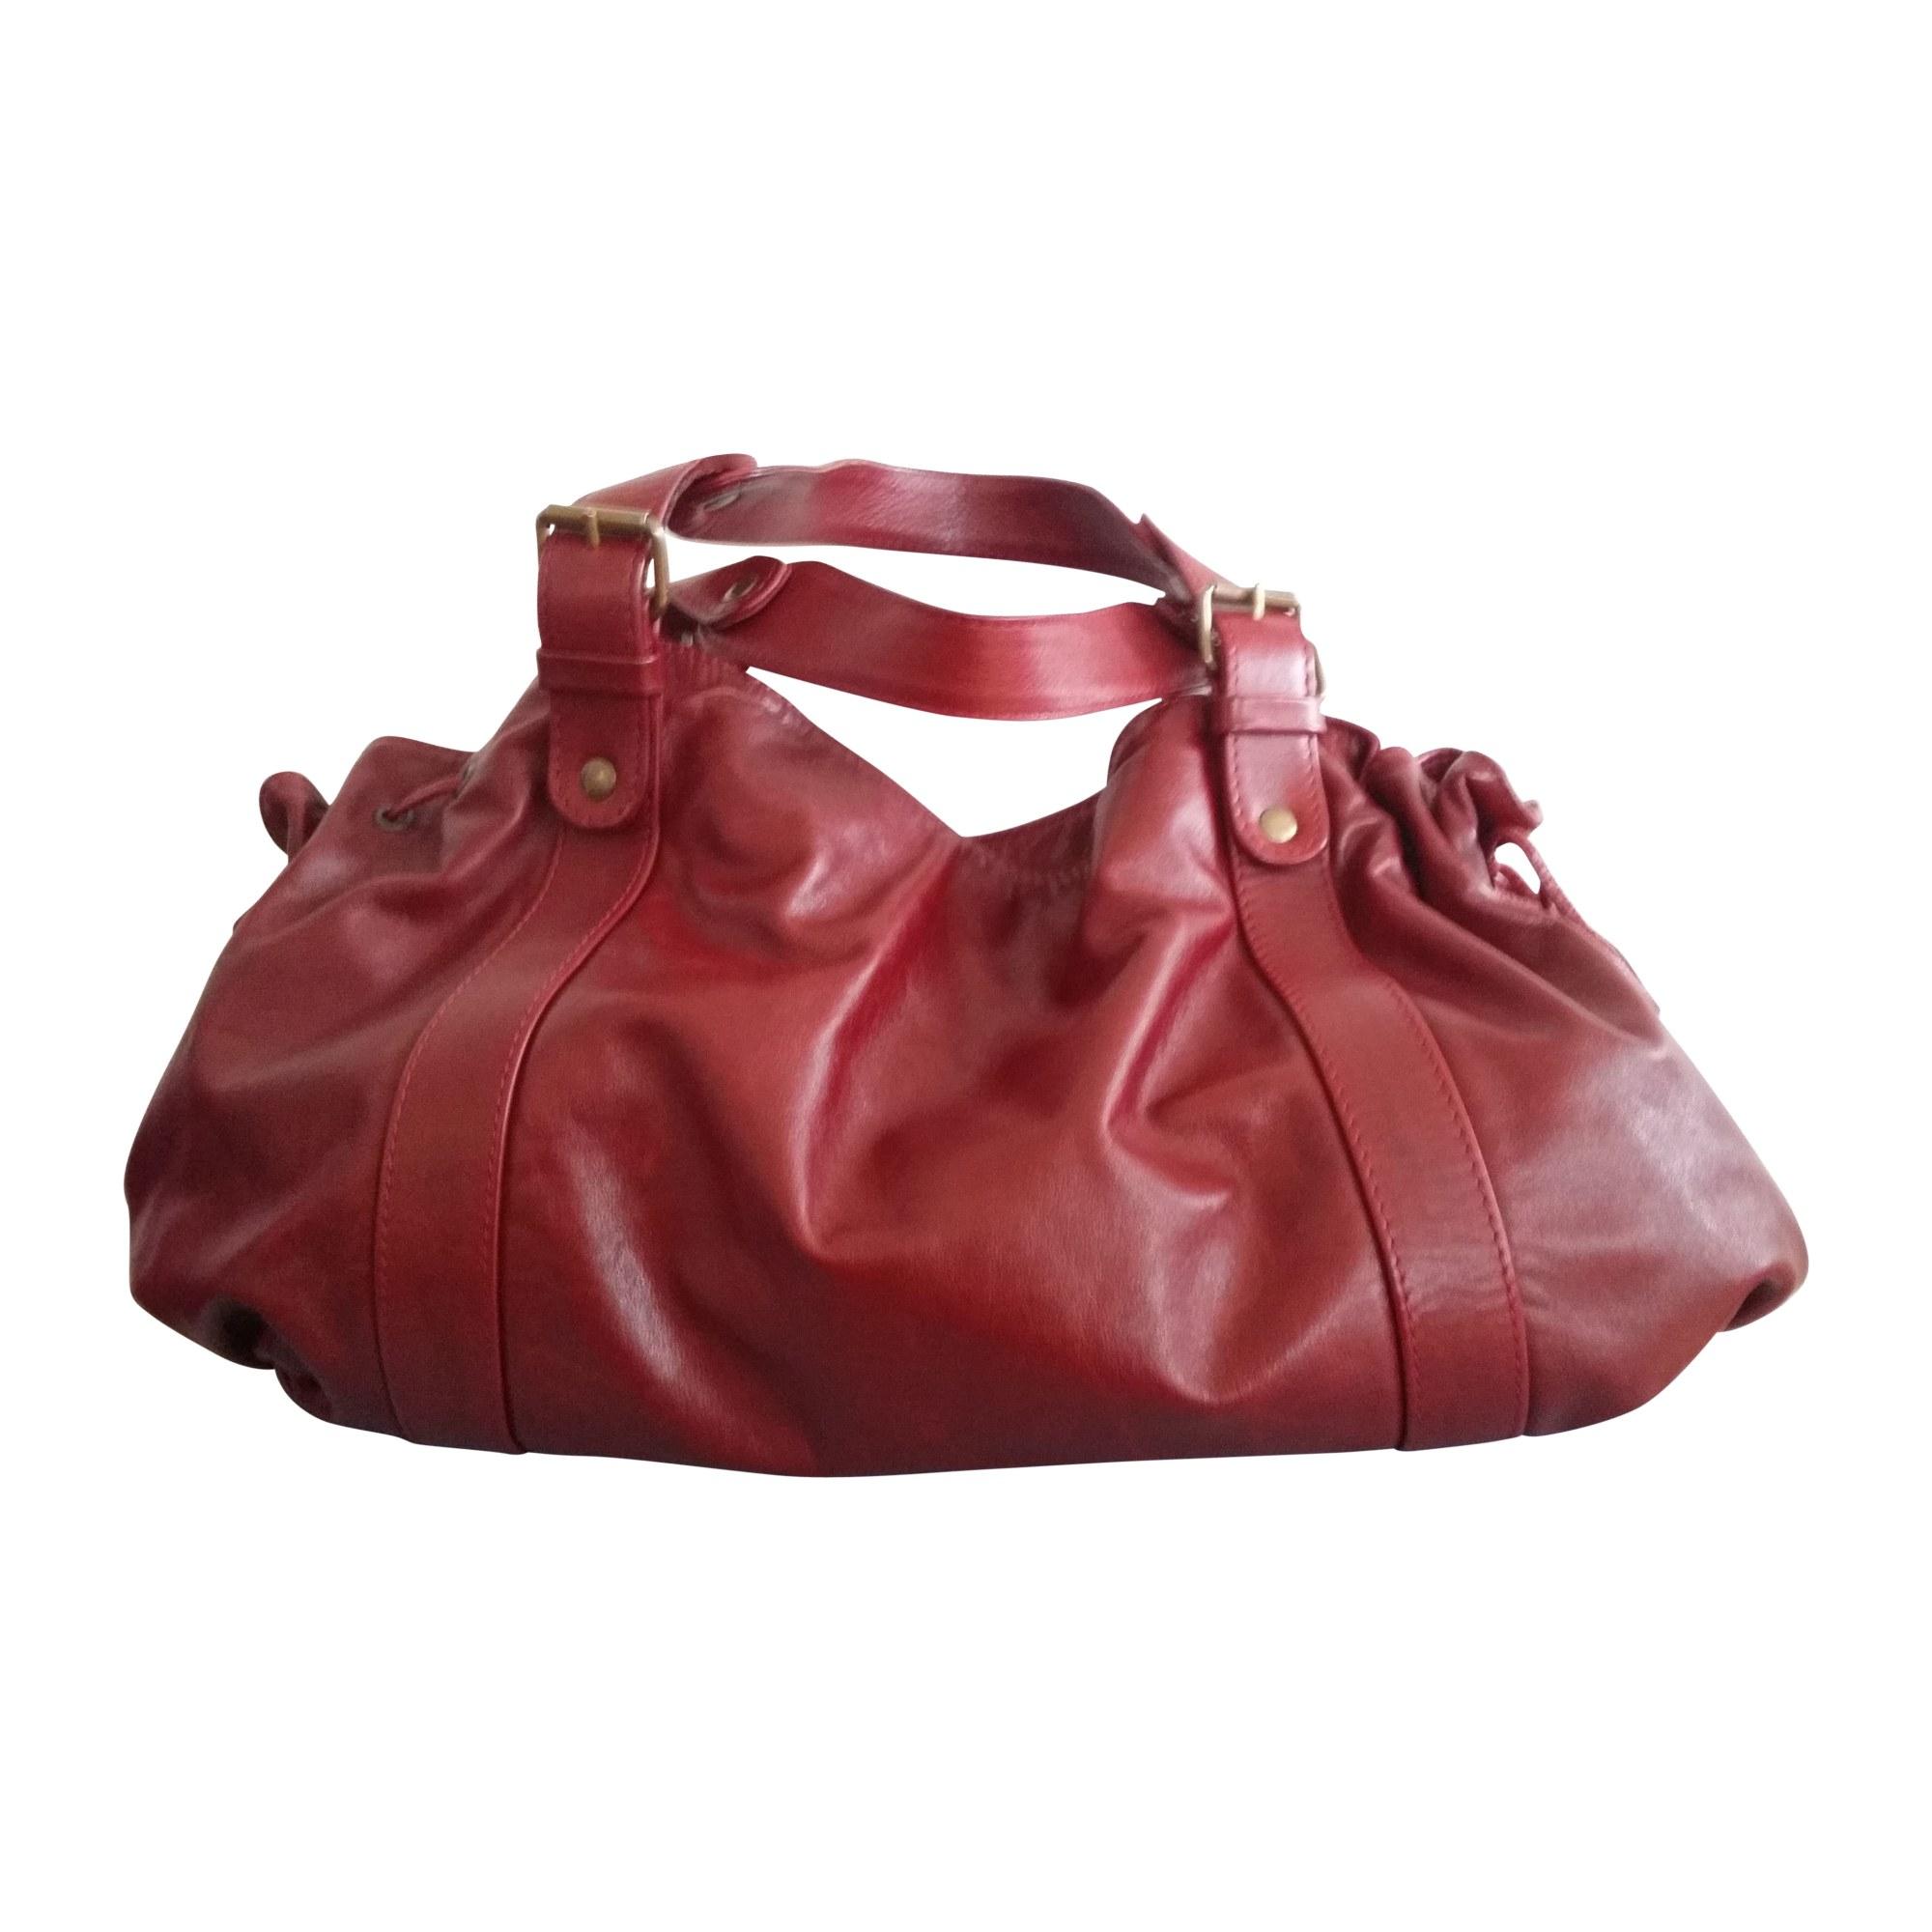 Sac à main en cuir GERARD DAREL rouge vendu par Mamzelle zaza - 2230600 5c73fd21154